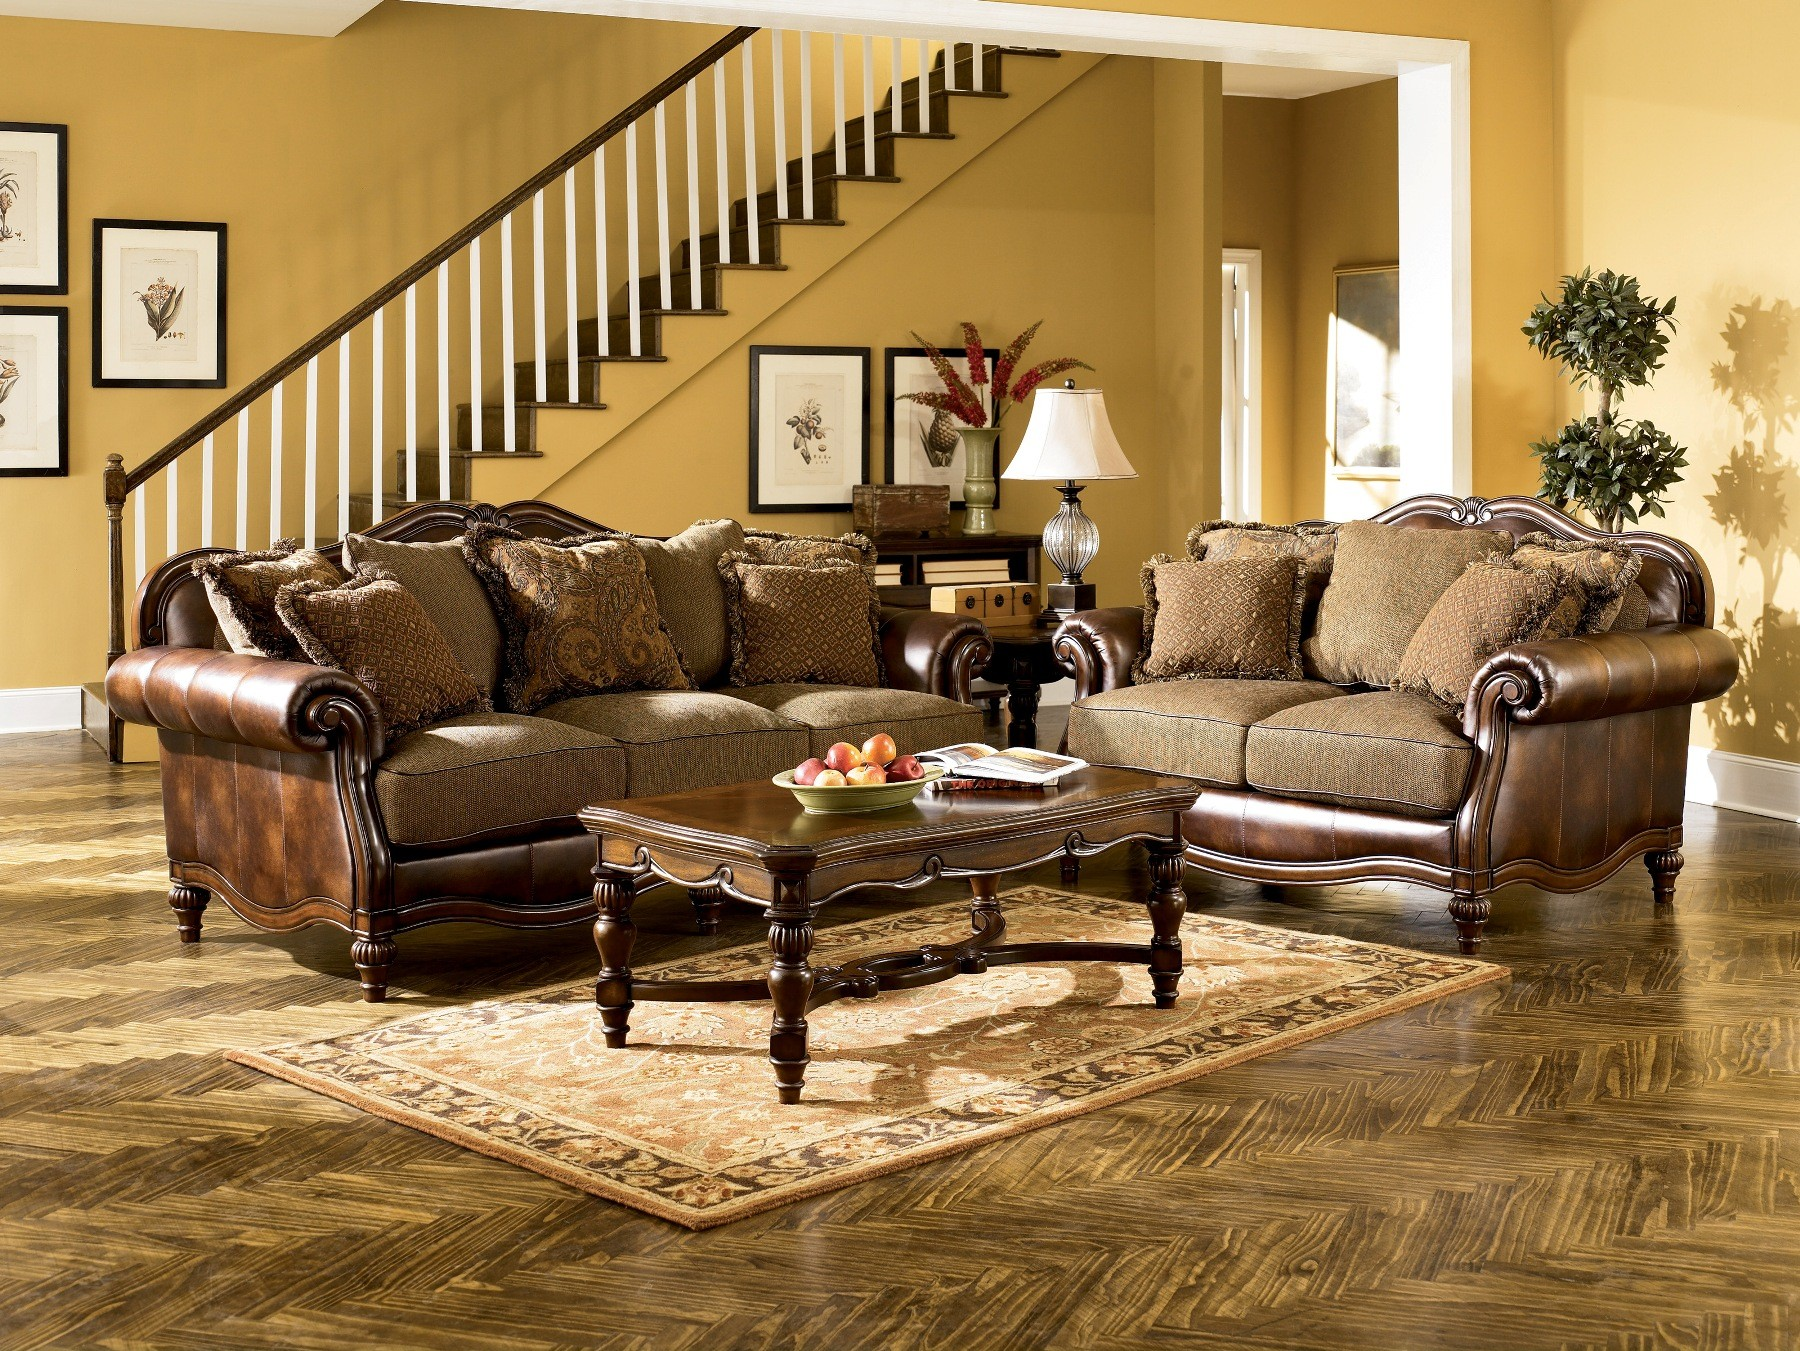 Claremore Antique Living Room Set From Ashley  Coleman - Antique living room furniture